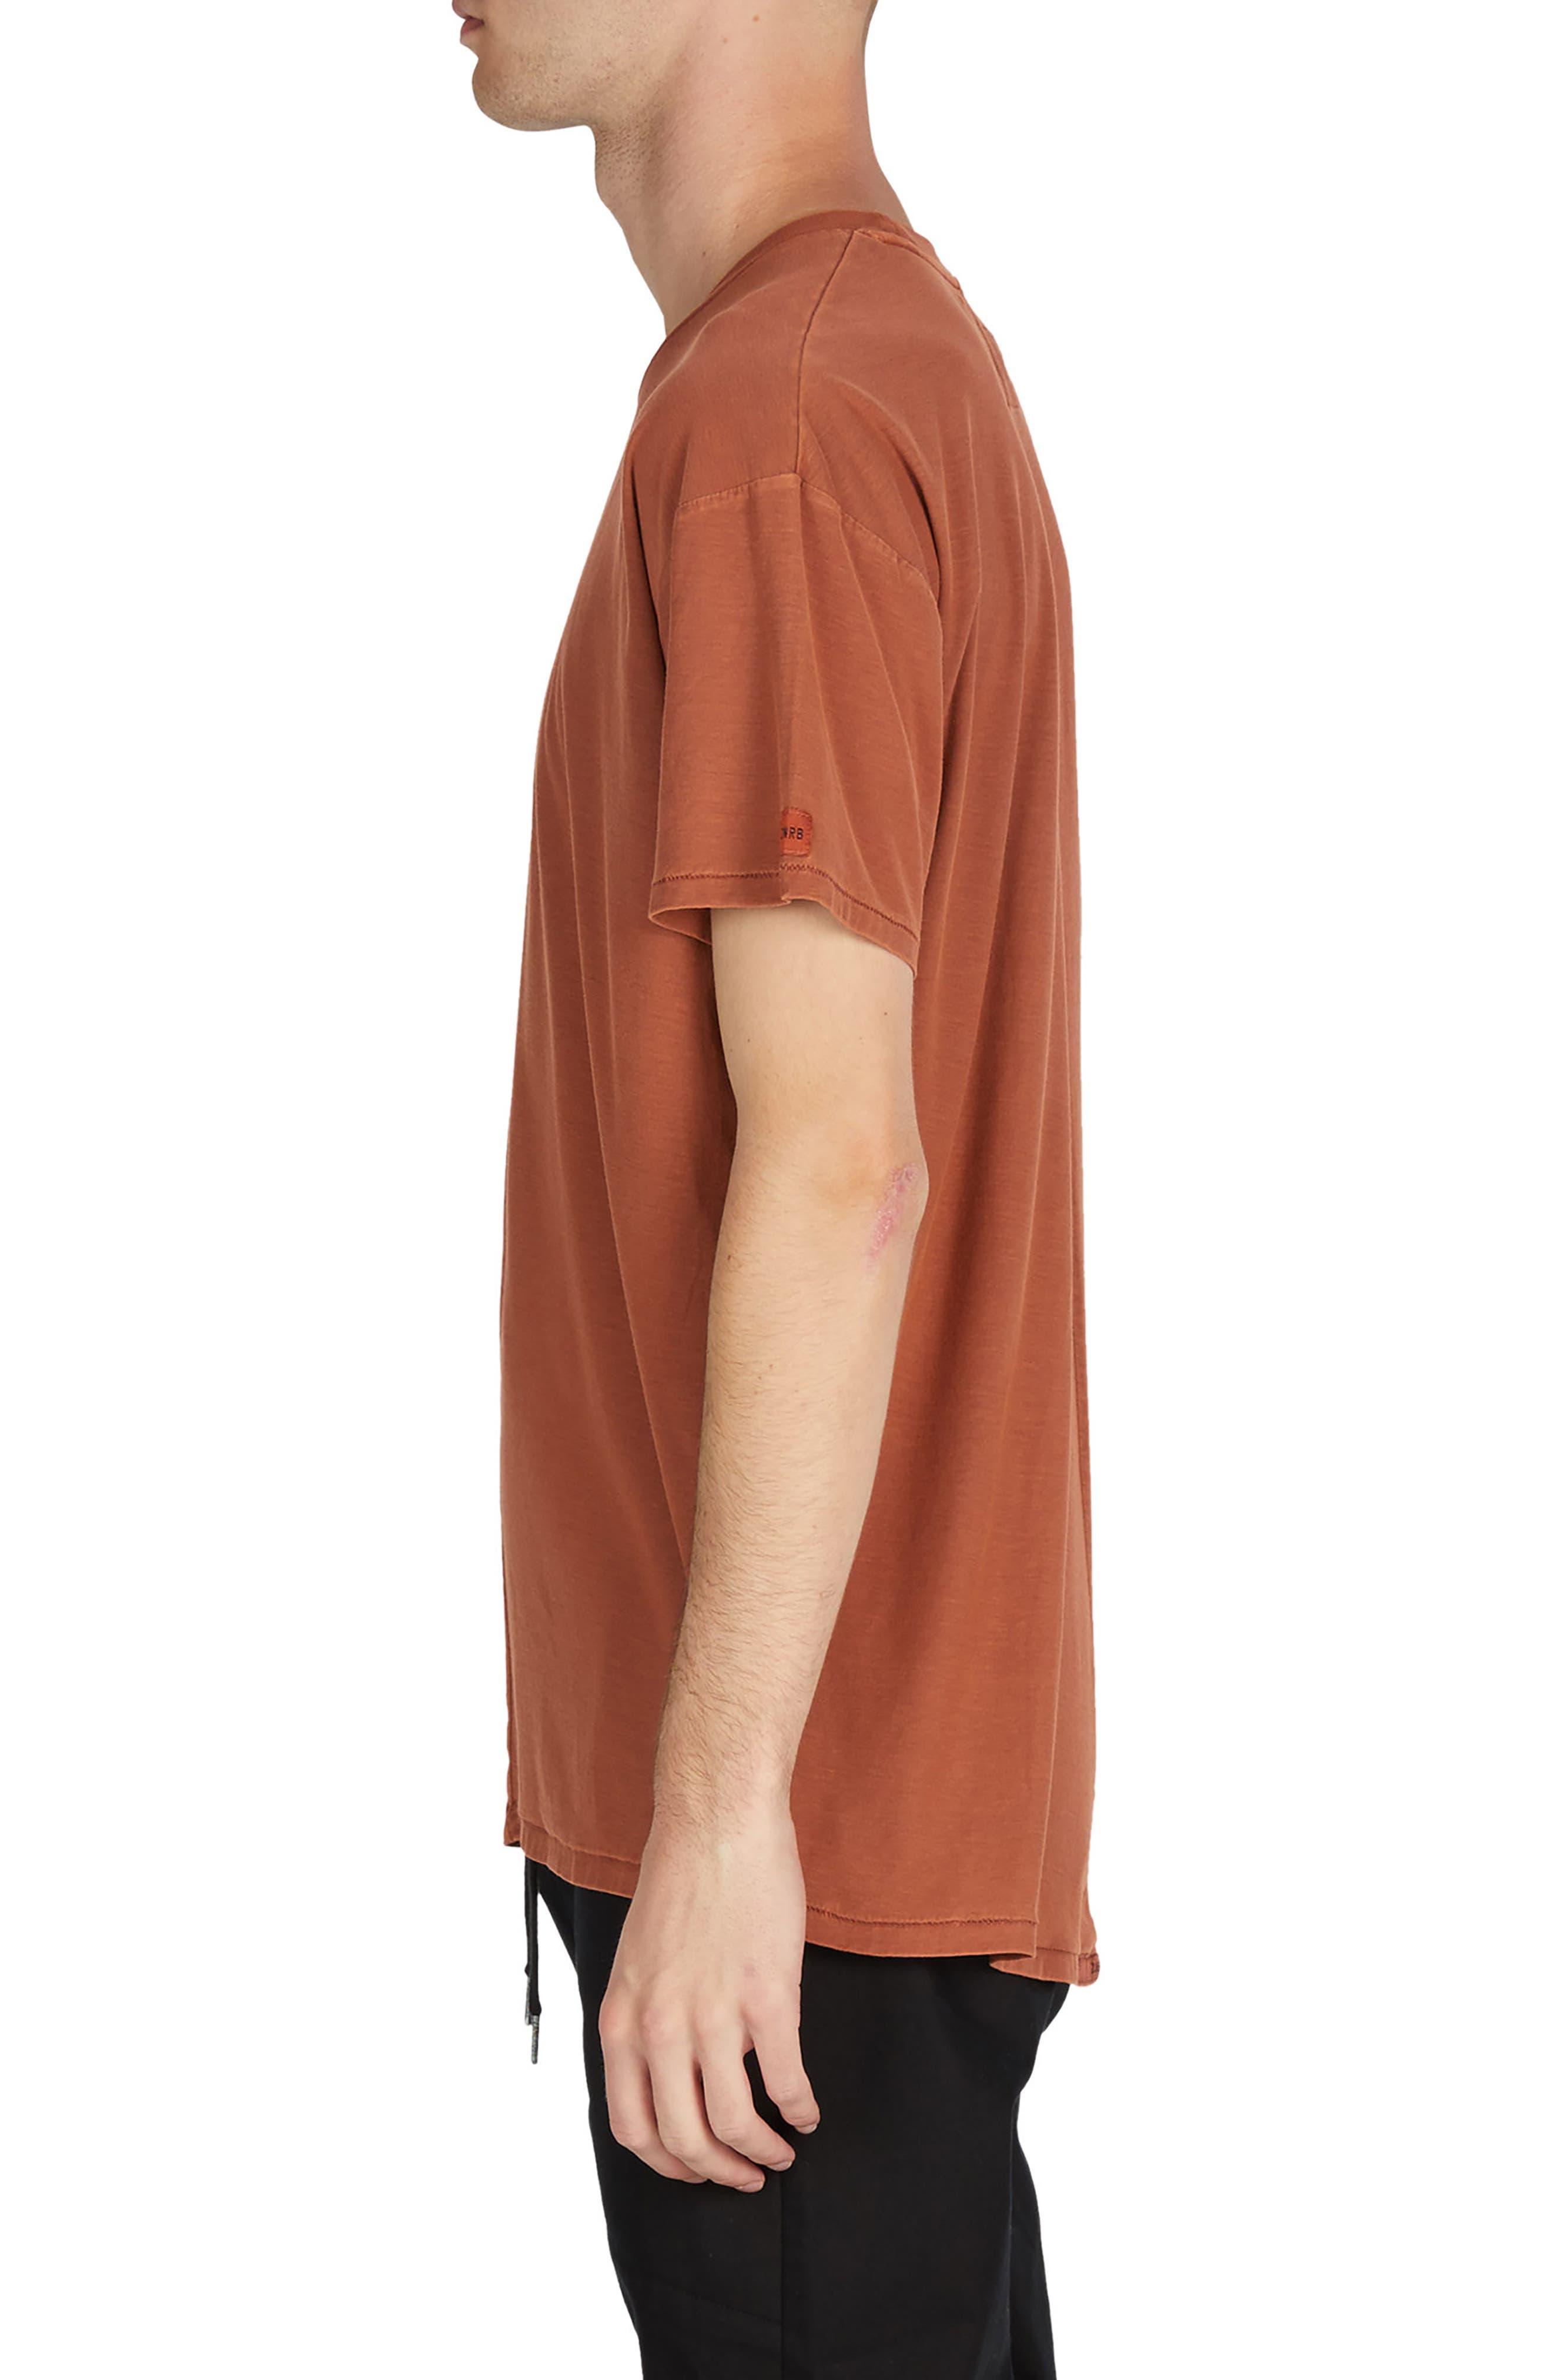 Rugger T-Shirt,                             Alternate thumbnail 3, color,                             800